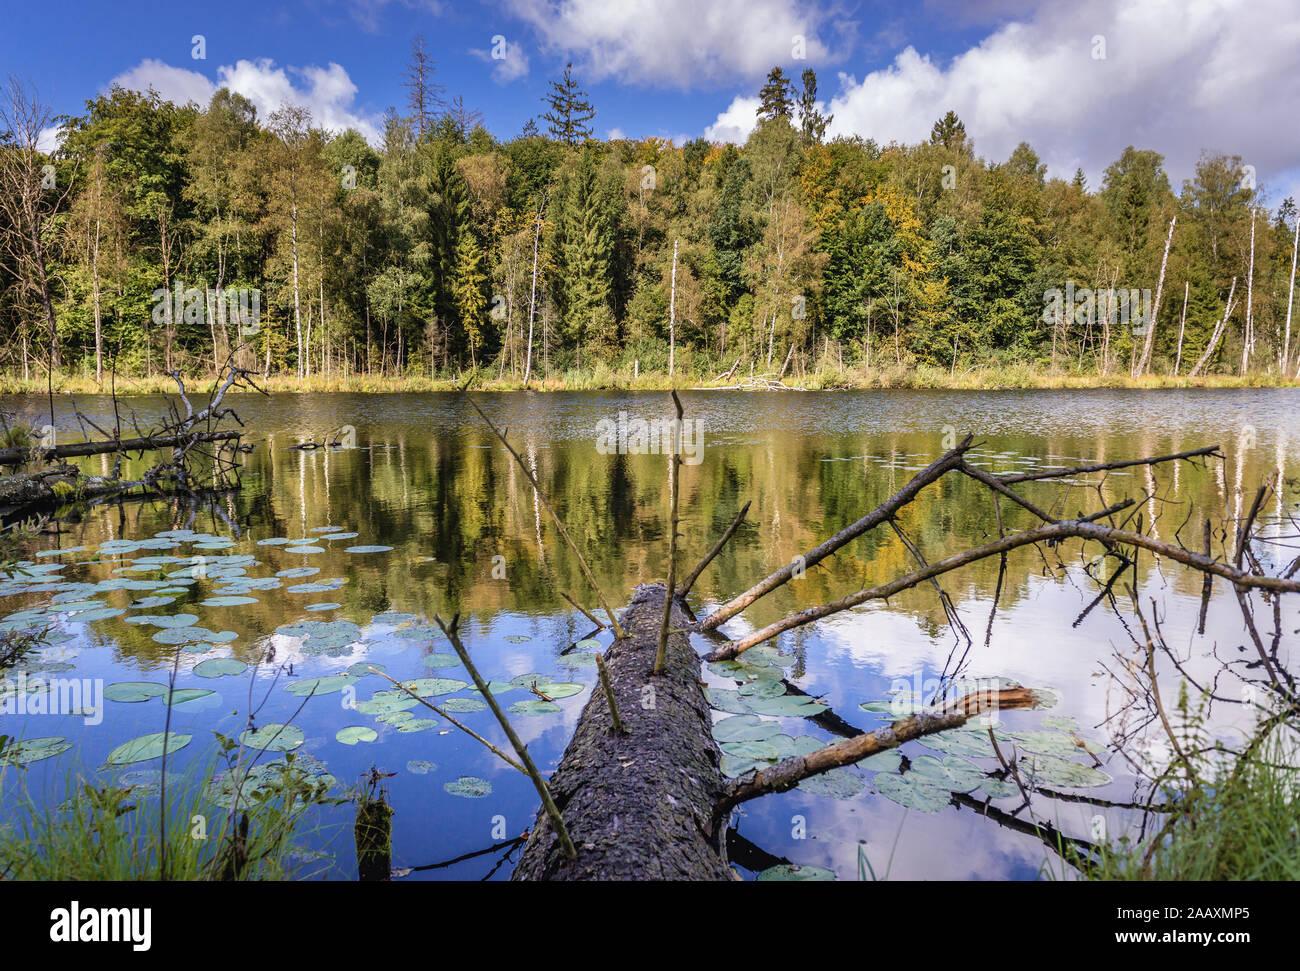 Vista sobre el lago Jezioro Francuskie (Francés) Reserva Natural Dylewo colinas parque paisajista, Ostroda County en Polonia Foto de stock